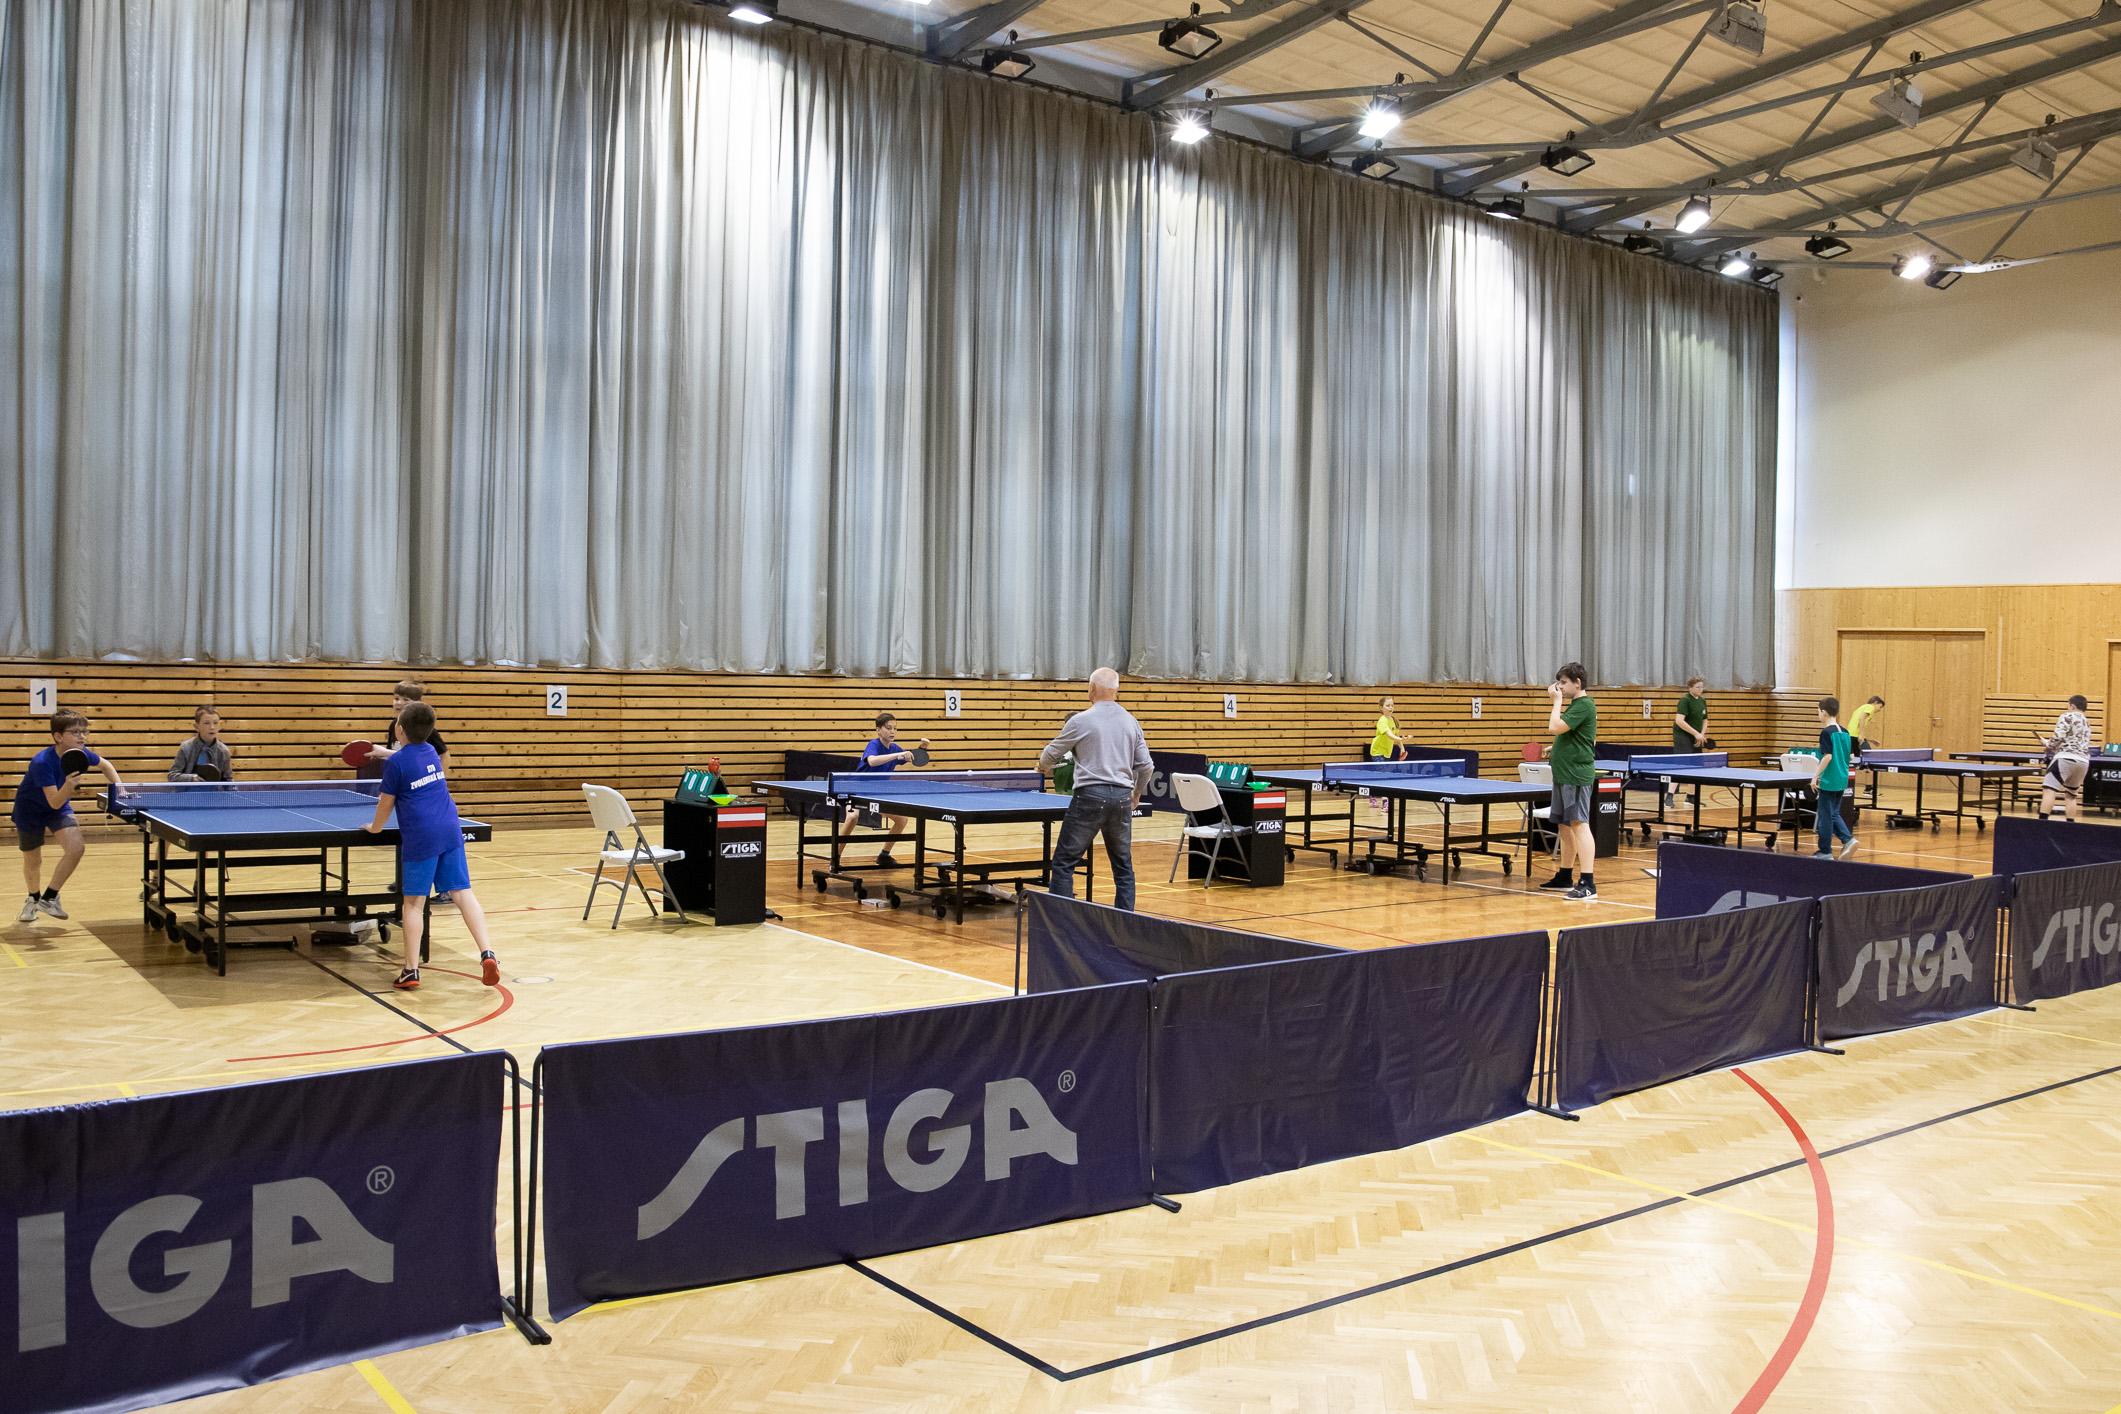 oblast-turnaj-mladeze-zv-dt-ka